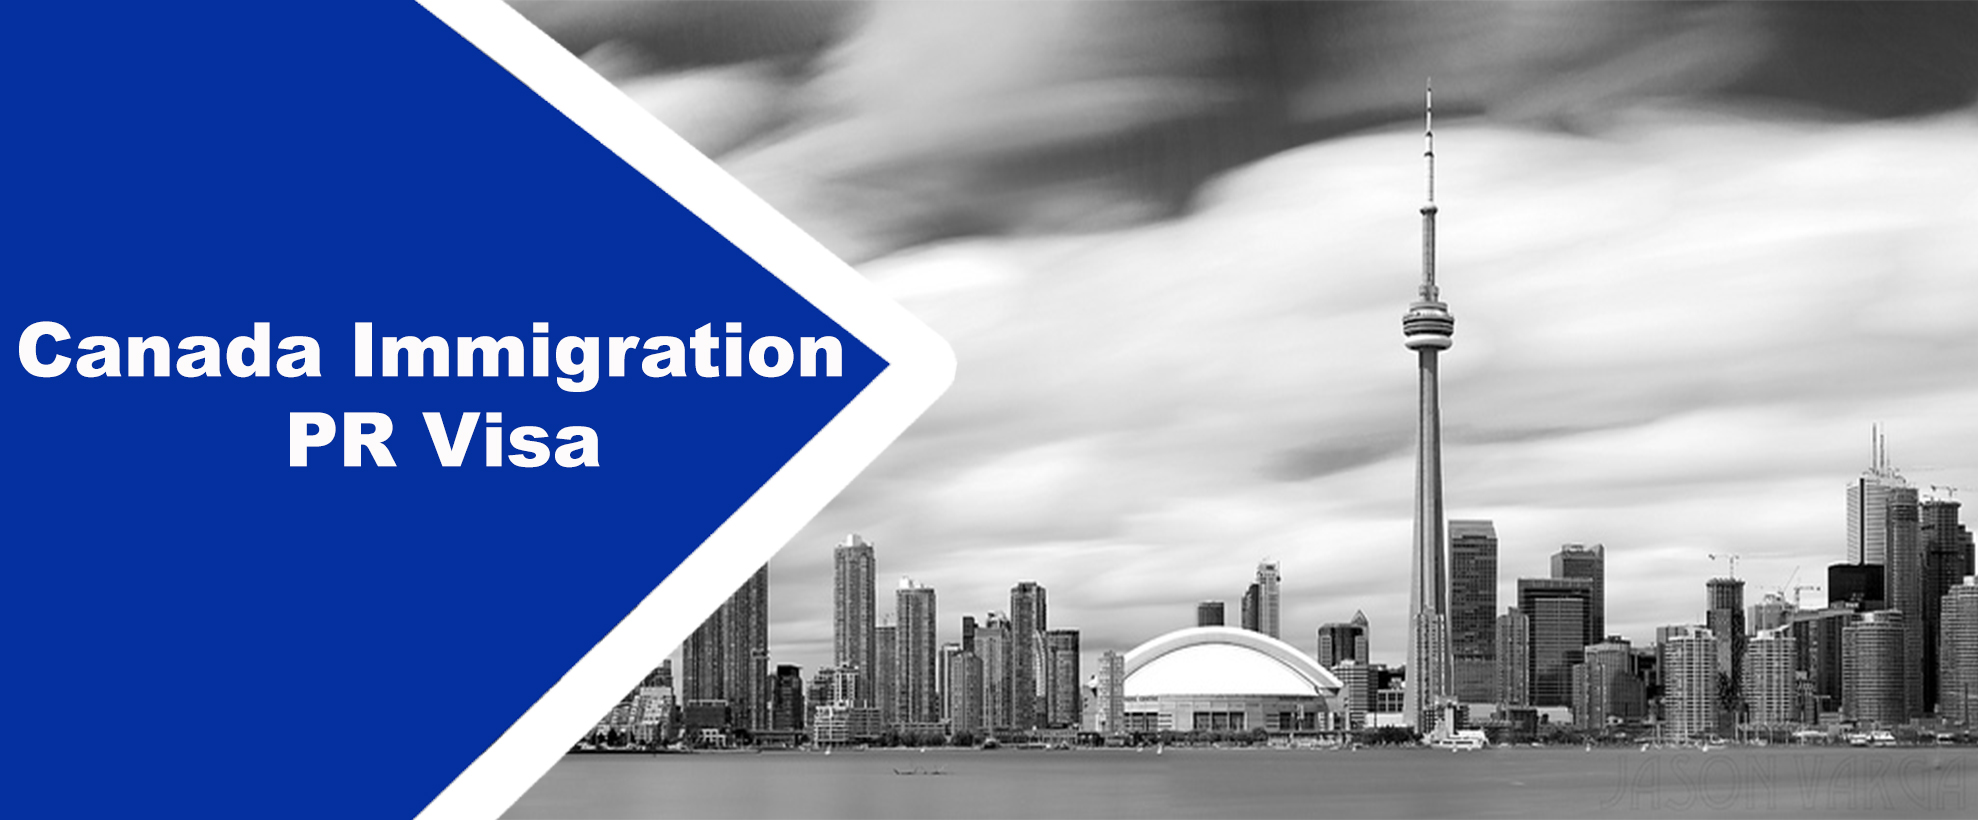 Canada Immigration PR Visa